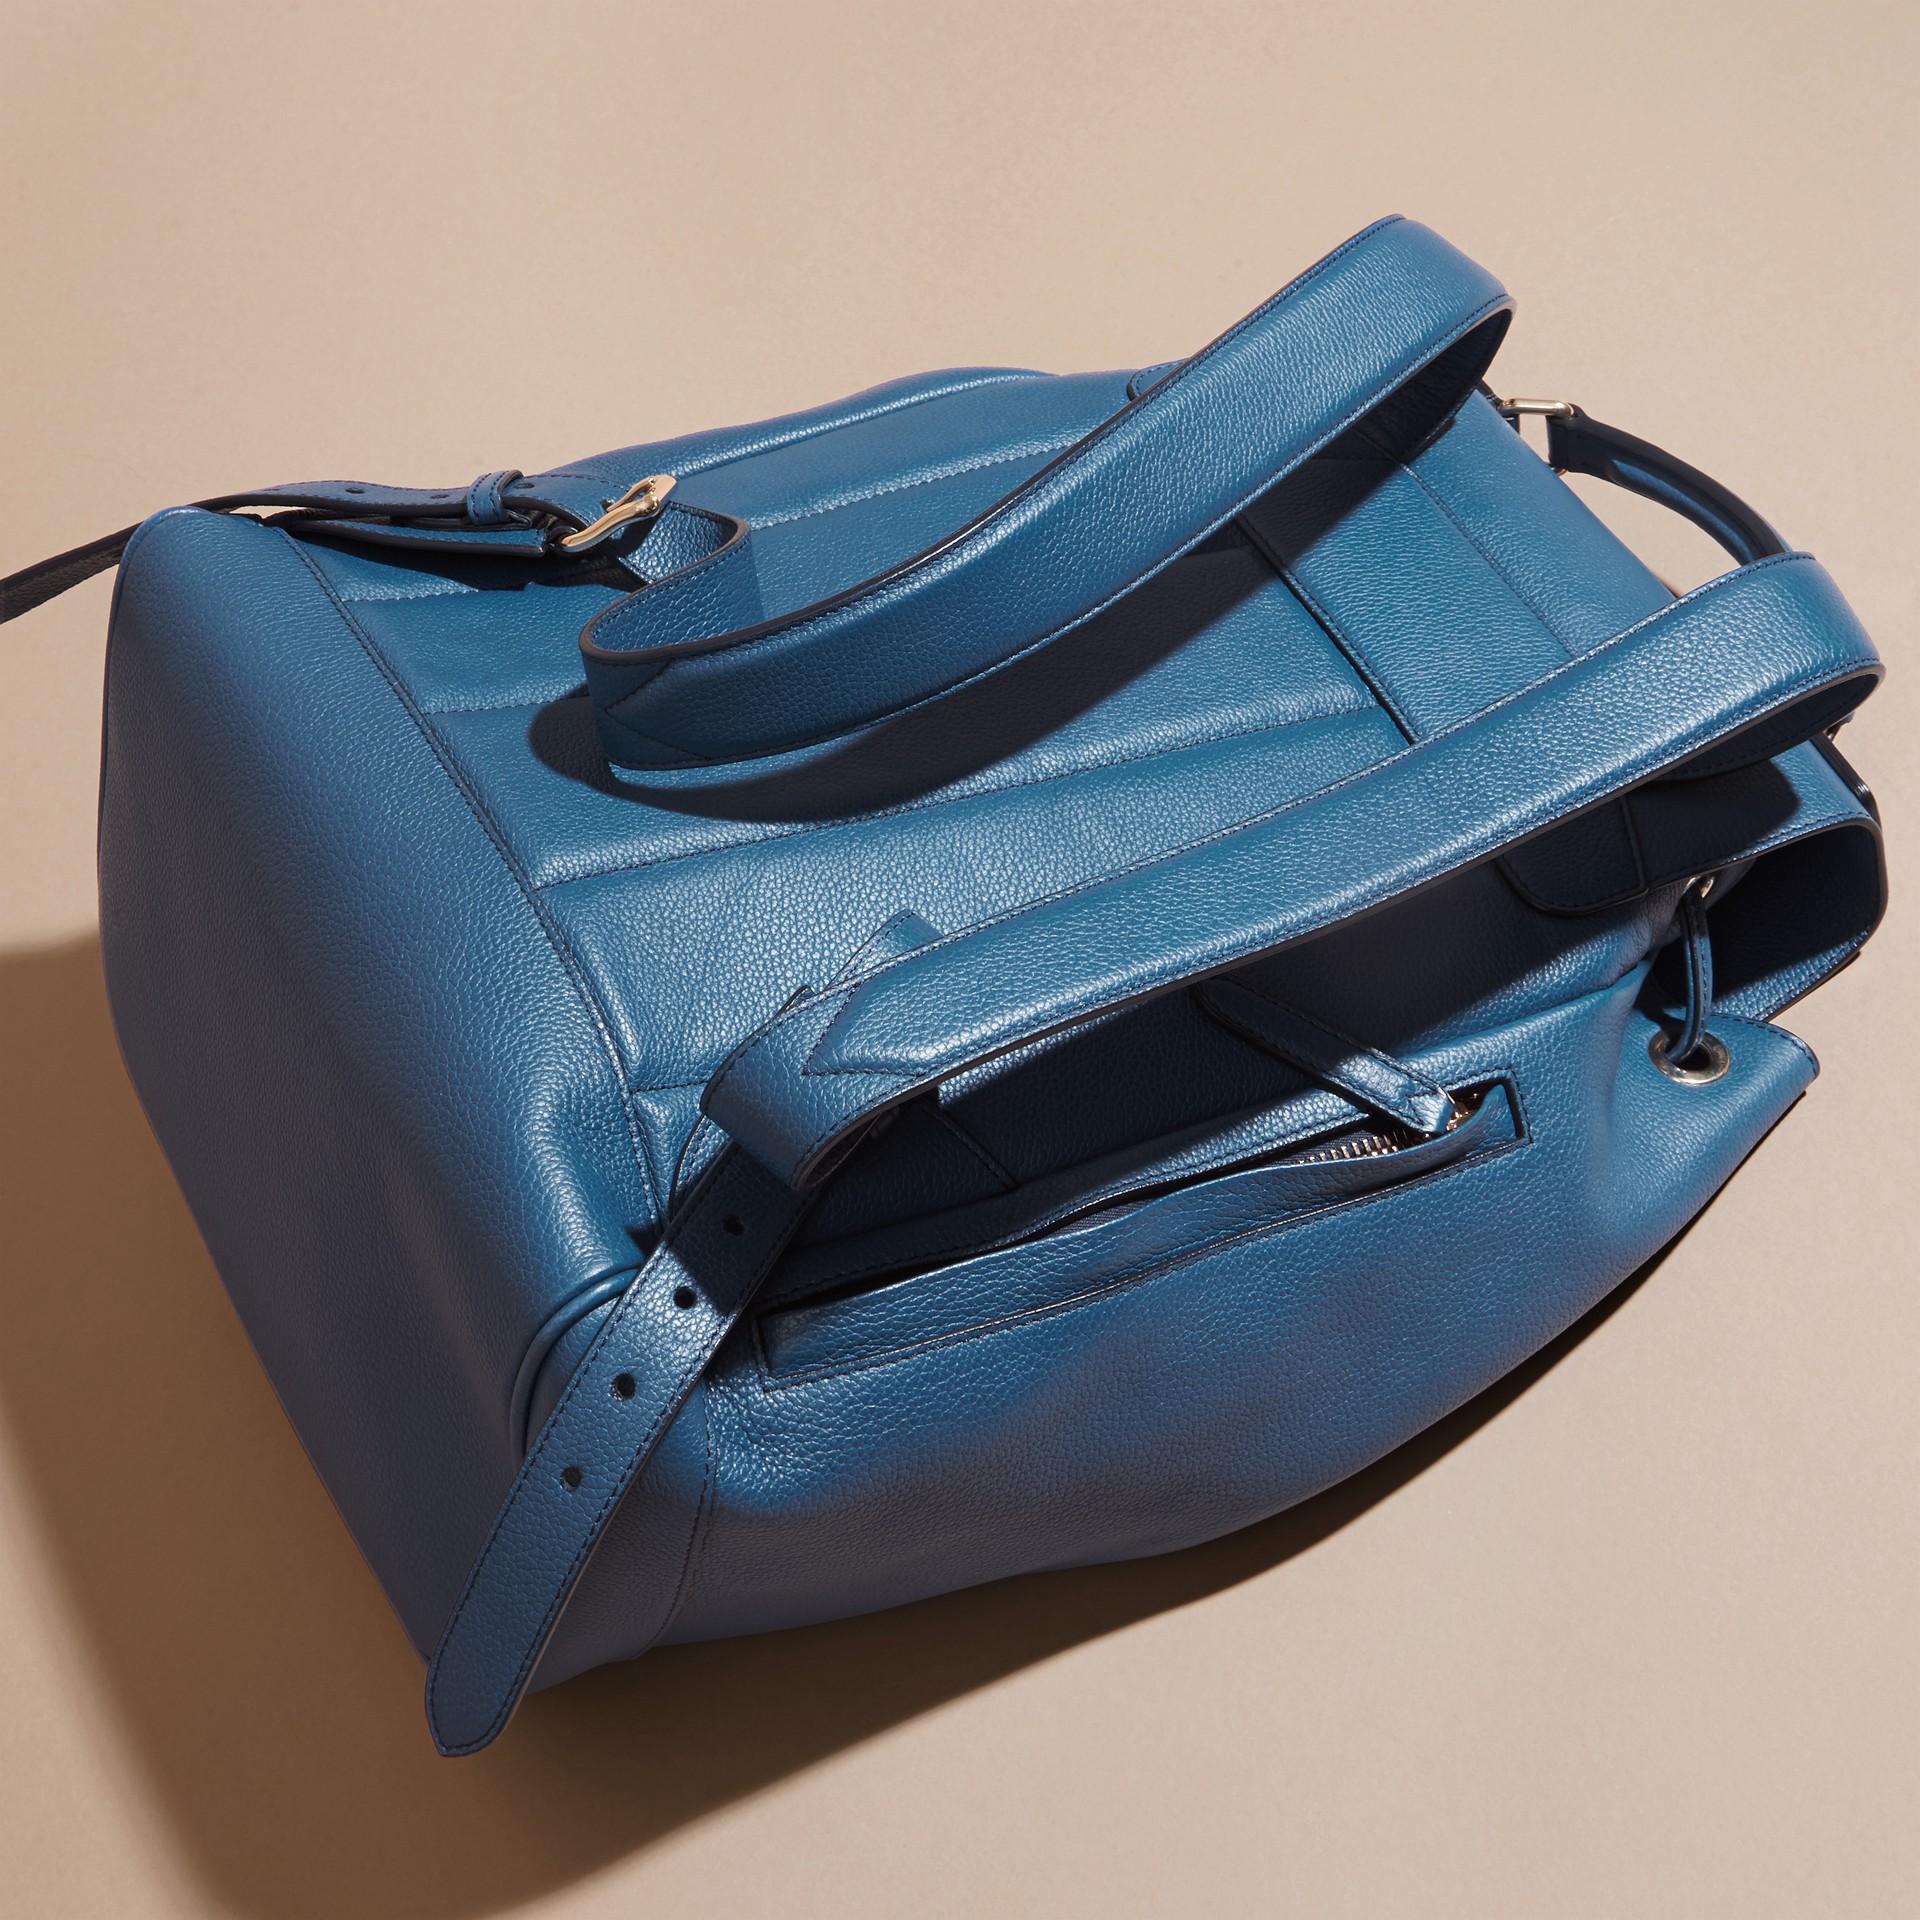 Mineralblau Rucksack aus genarbtem Leder Mineralblau - Galerie-Bild 5